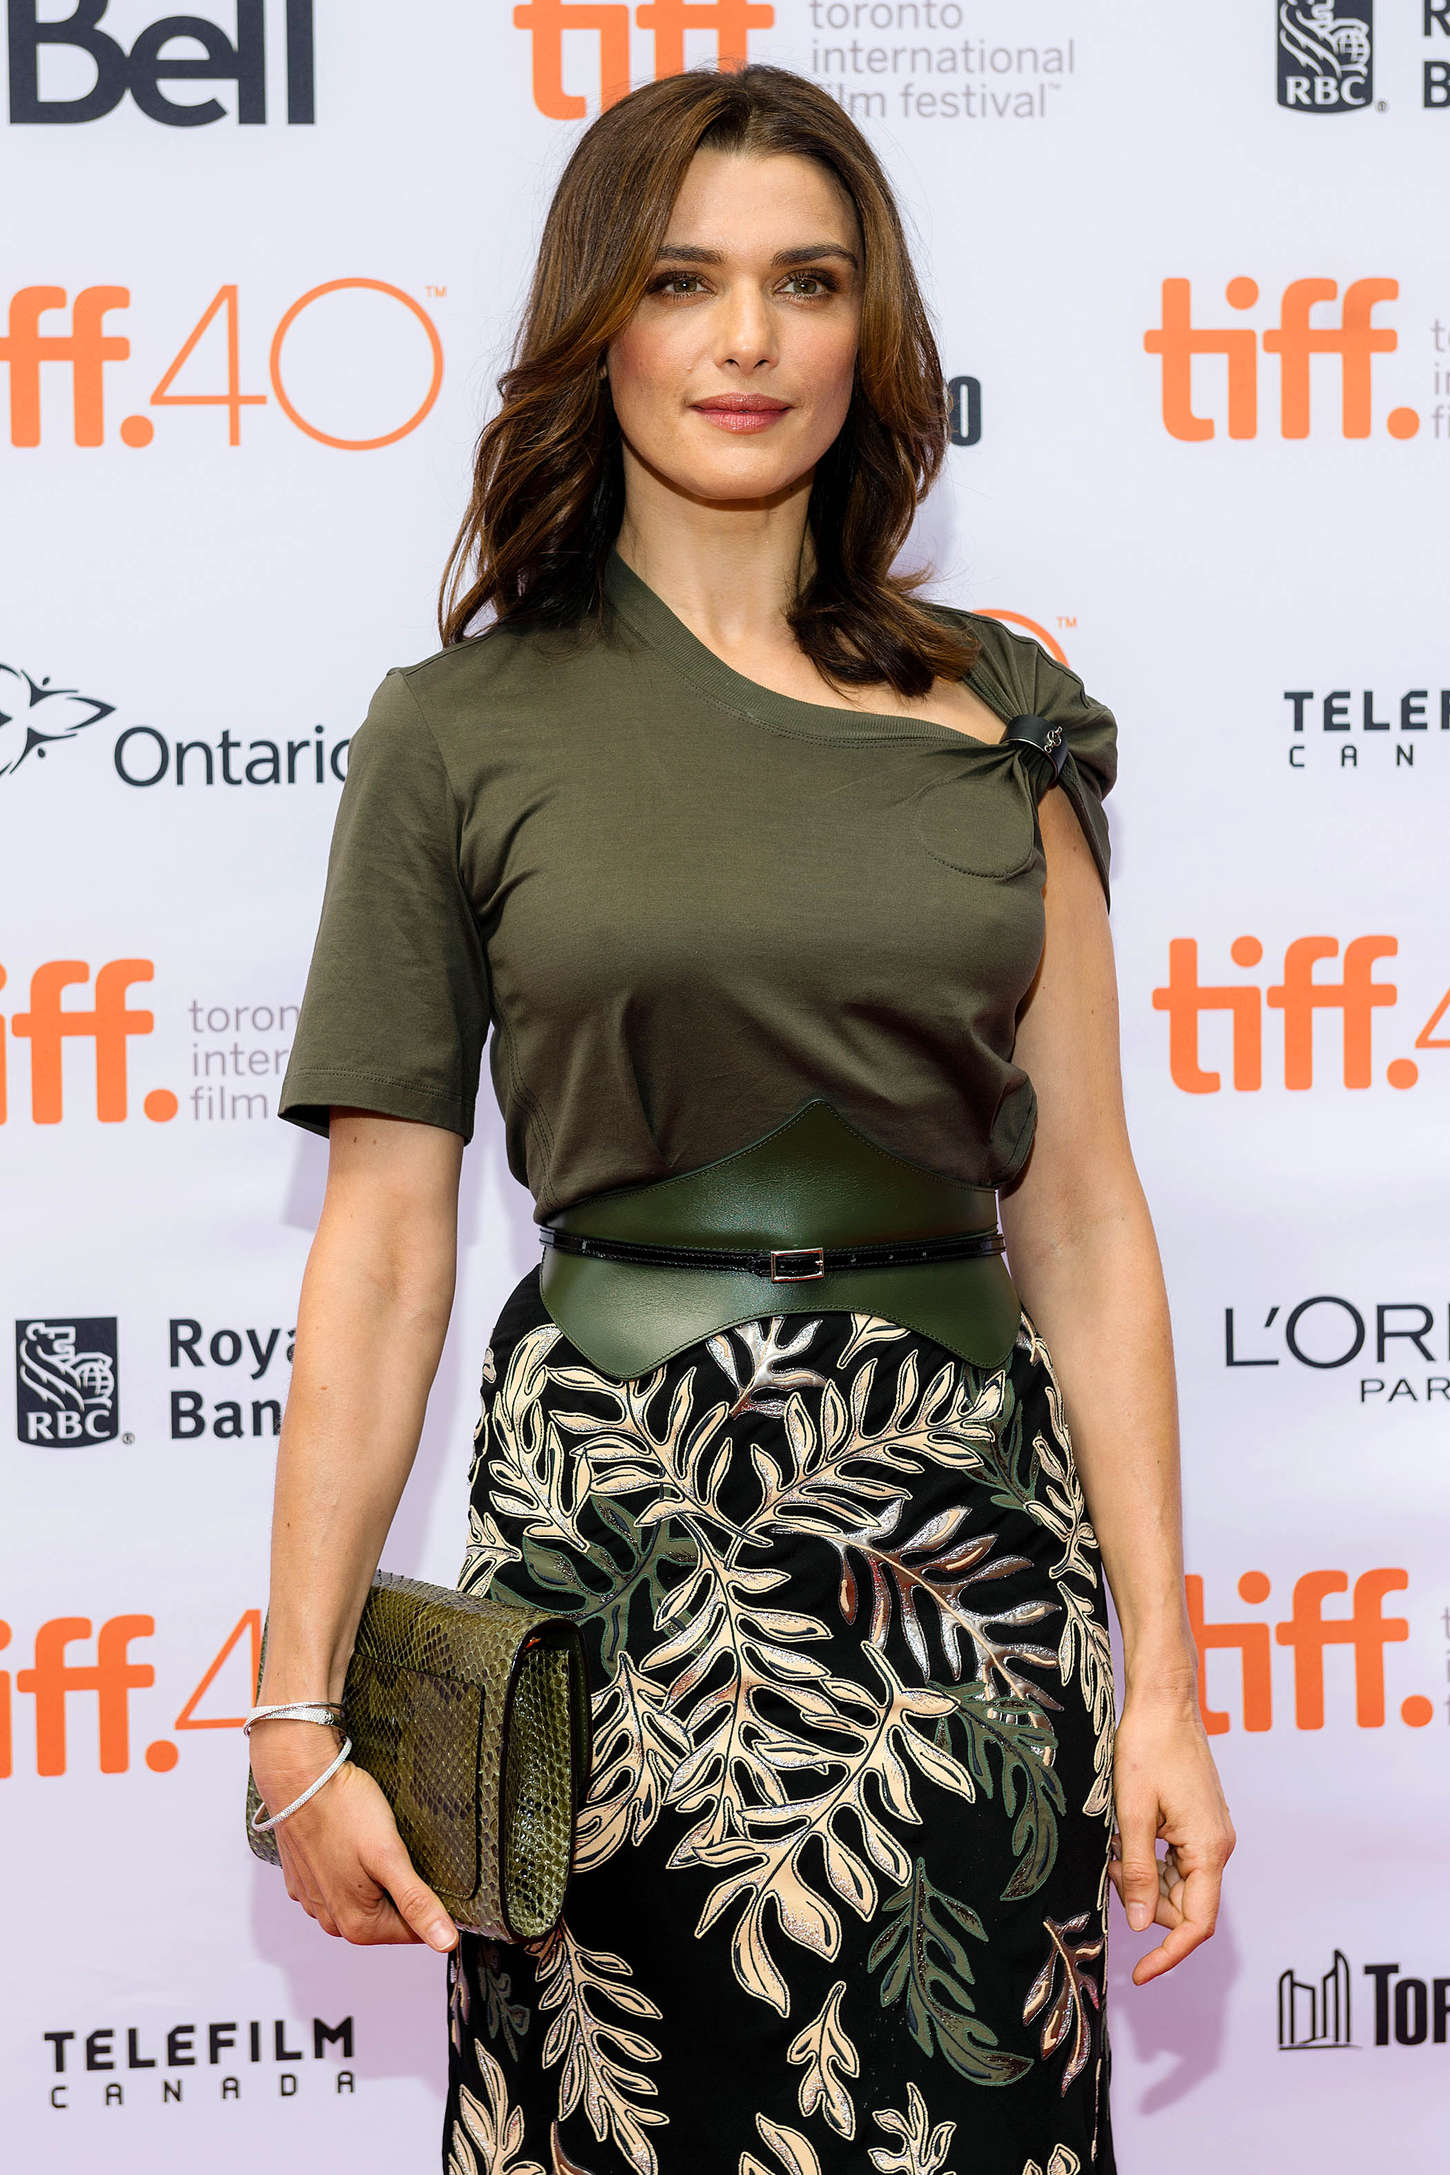 Rachel Weisz 2015 : Rachel Weisz: The Lobster Premiere -02